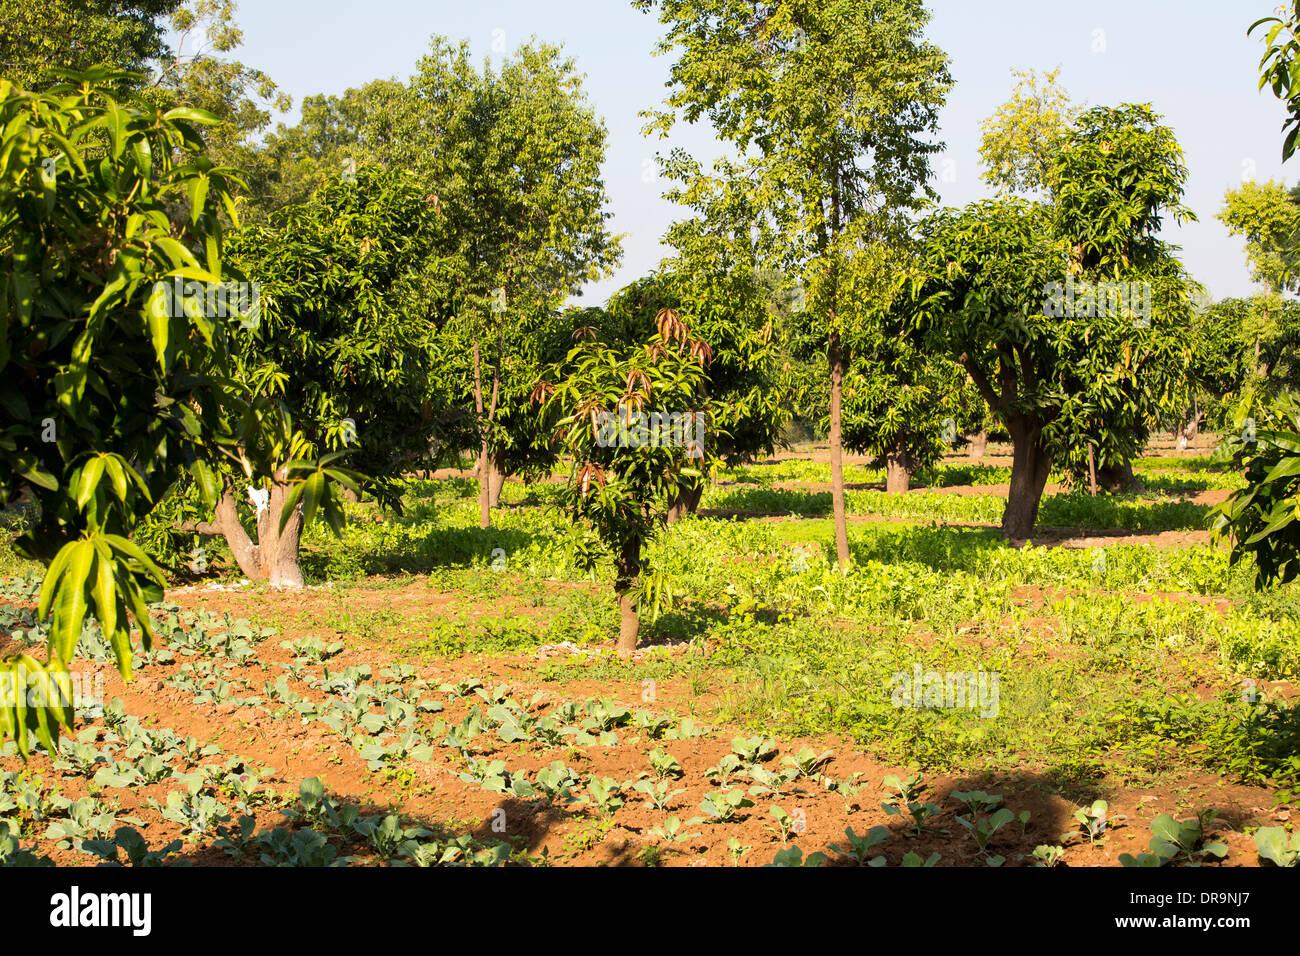 organic gardens that grow 70% of the Ashram's food,  Muni Seva Ashram in Goraj, near Vadodara, India - Stock Image